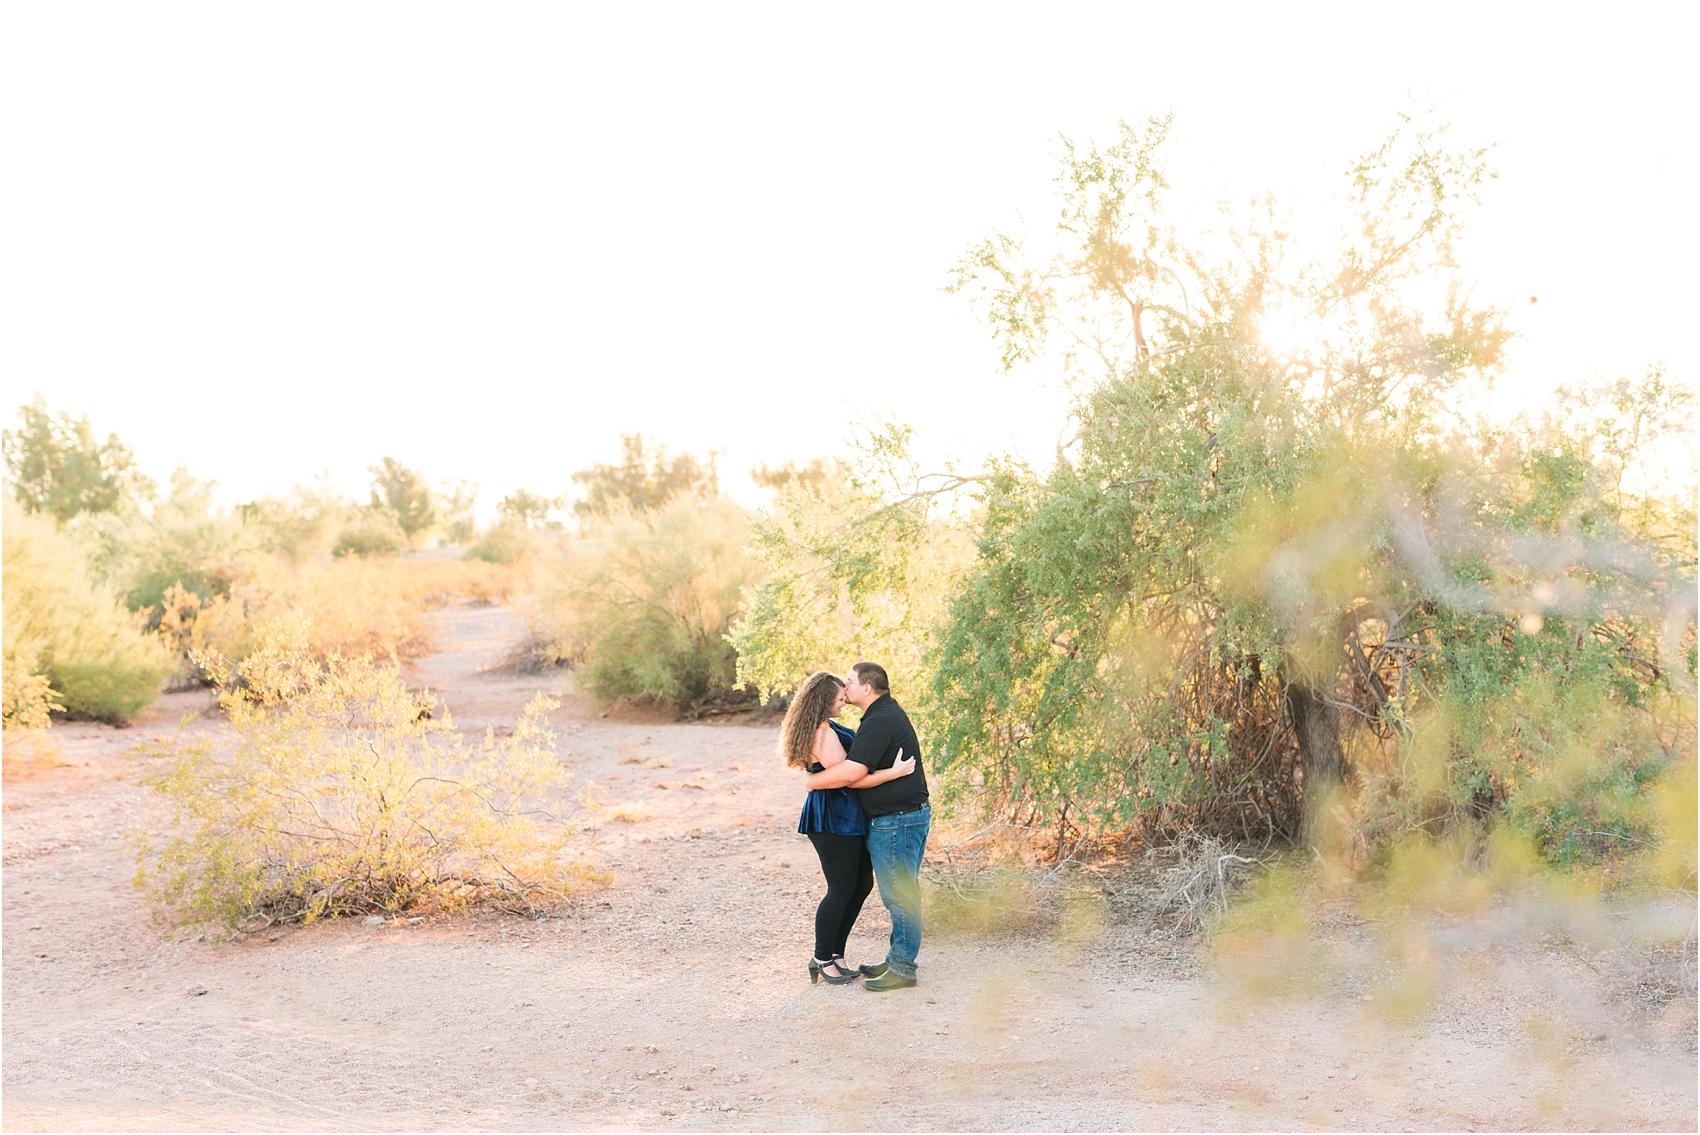 romantic-desert-engagement-photos-in-scottsdale-arizona-courtney-carolyn-photography-by-katelyn-james_0027.jpg